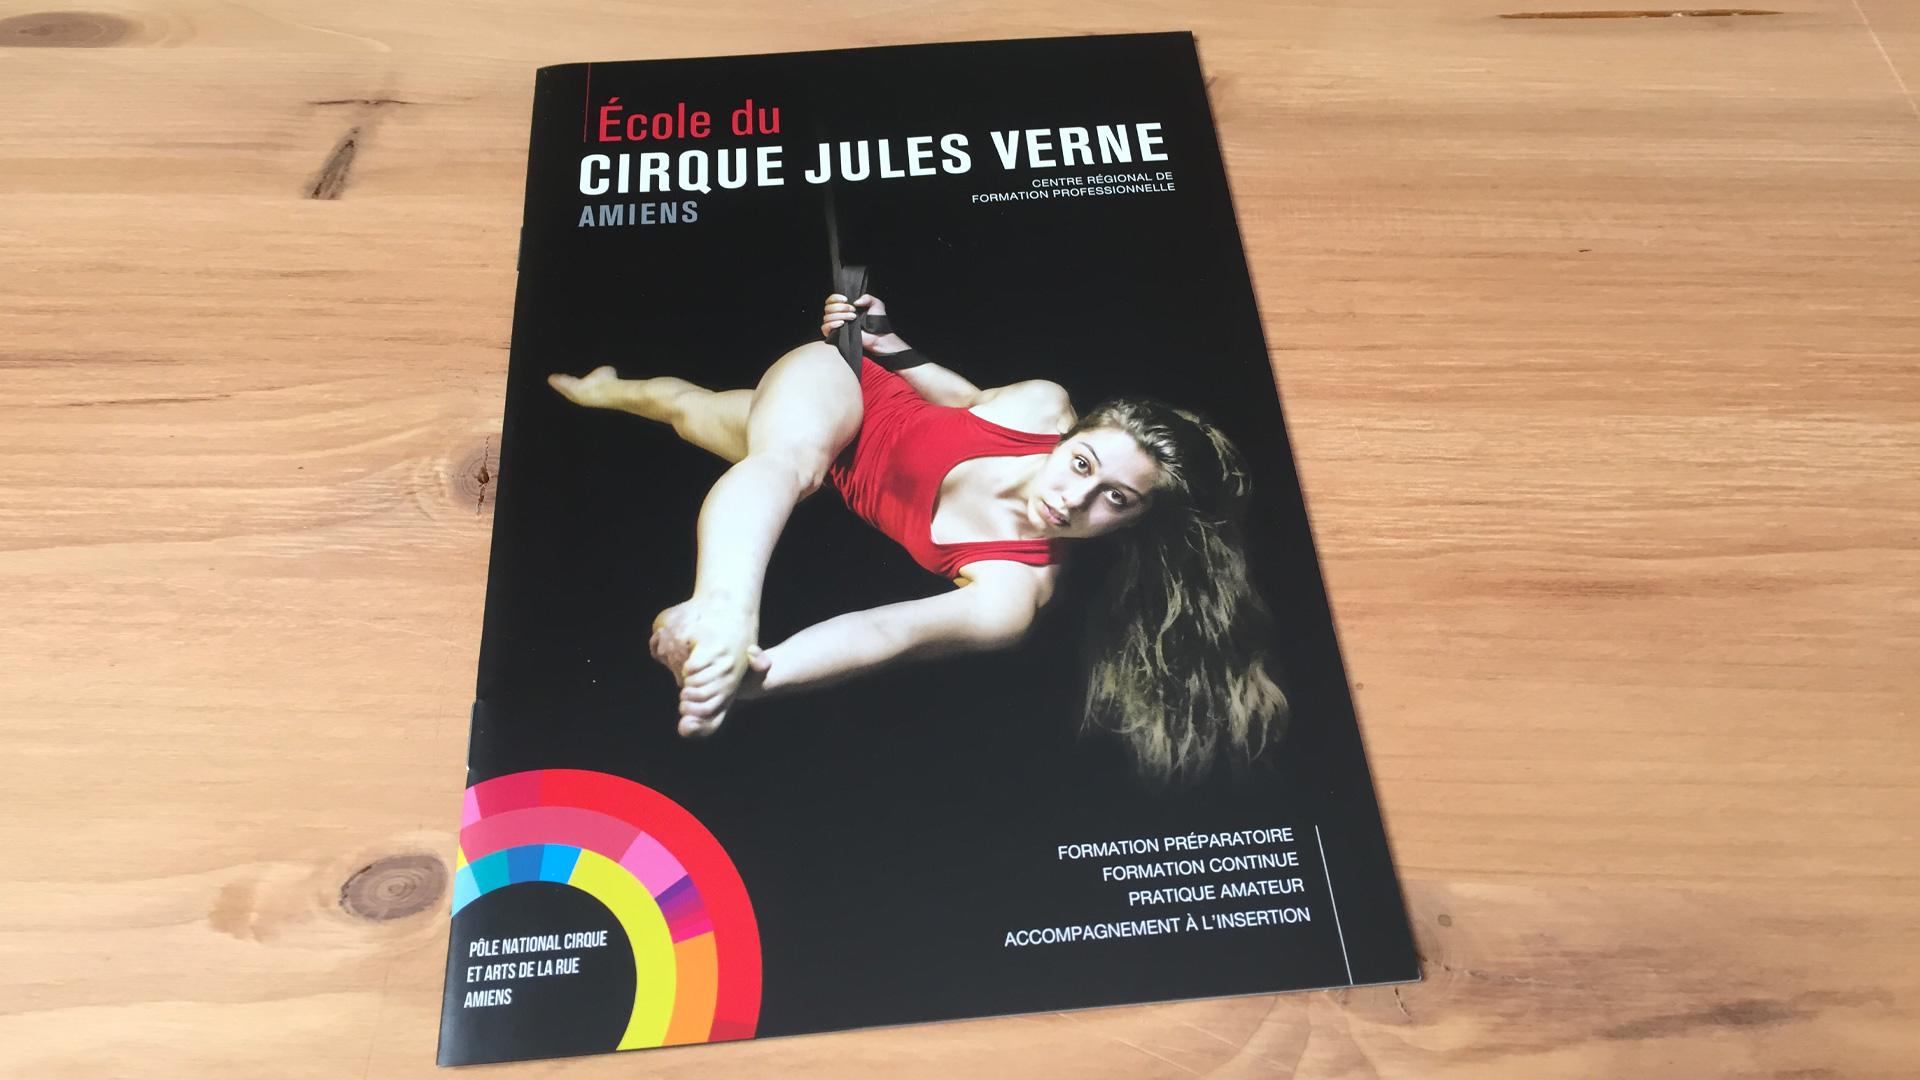 Ecole du Cirque Jules Verne – Amiens